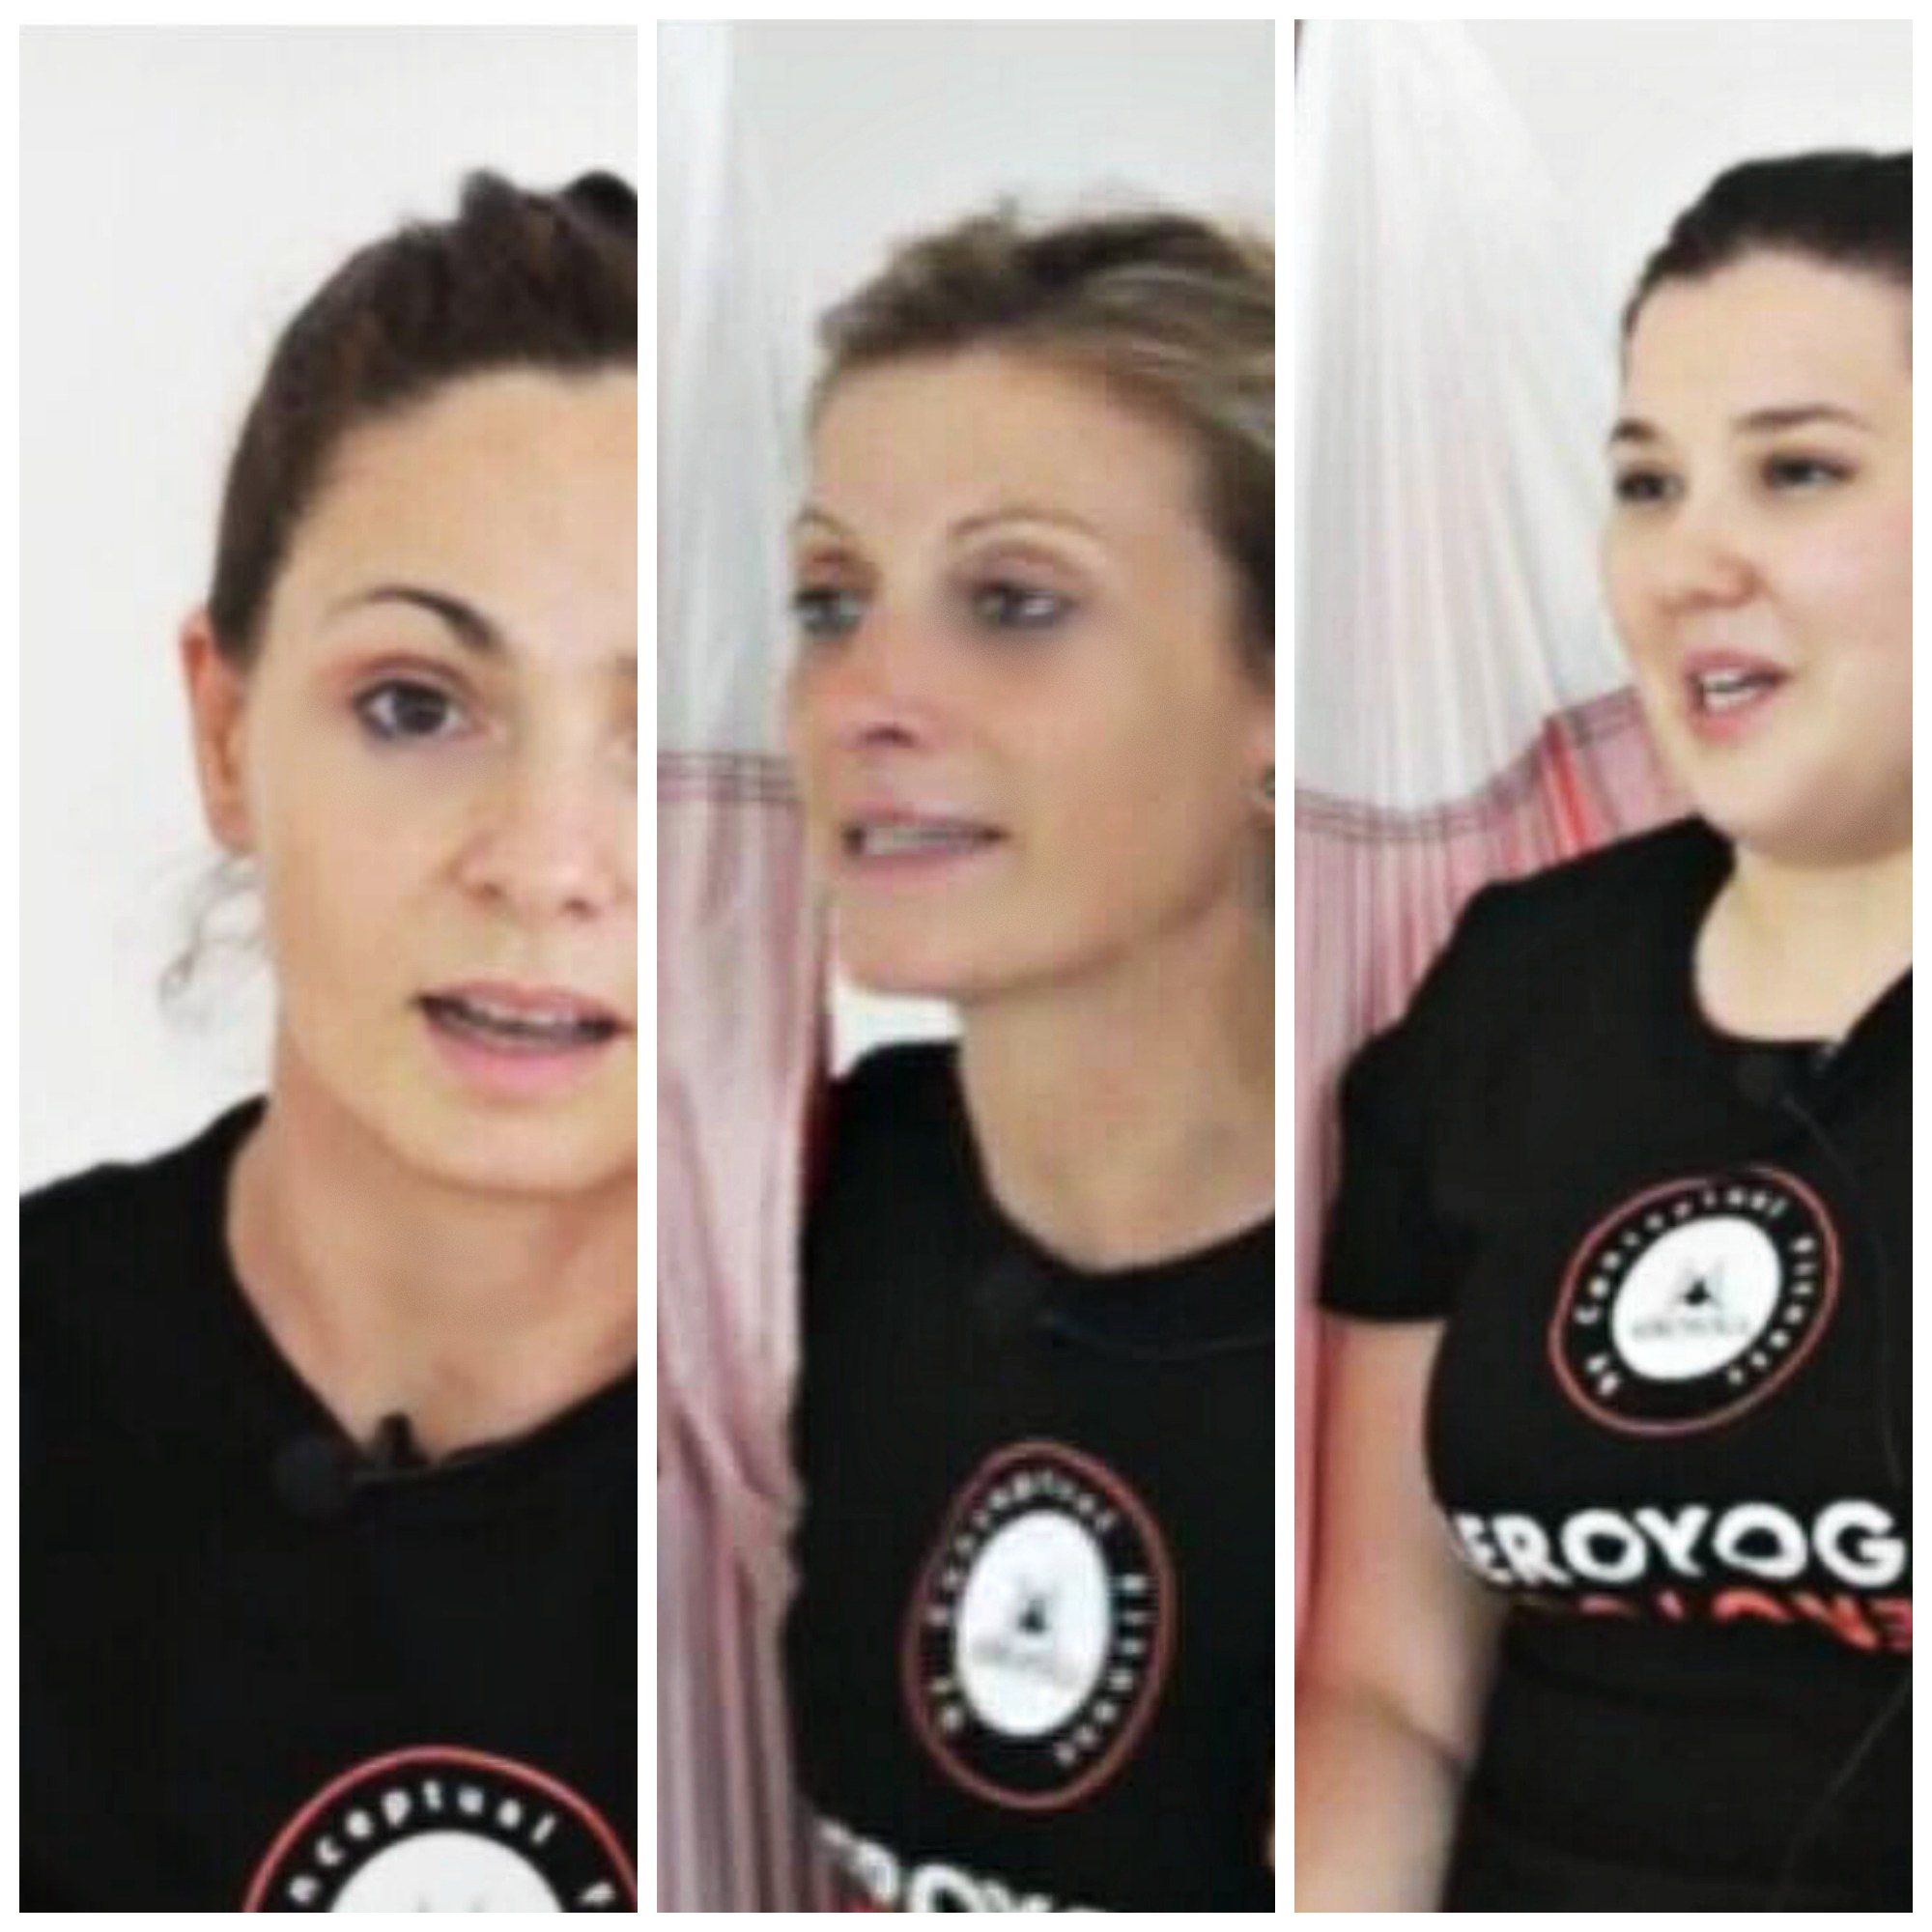 Certificación Yoga Aéreo, Descubre 3 Testimonios de las Alumnas Cursos Formación AeroYoga ® y AeroPilates ® España